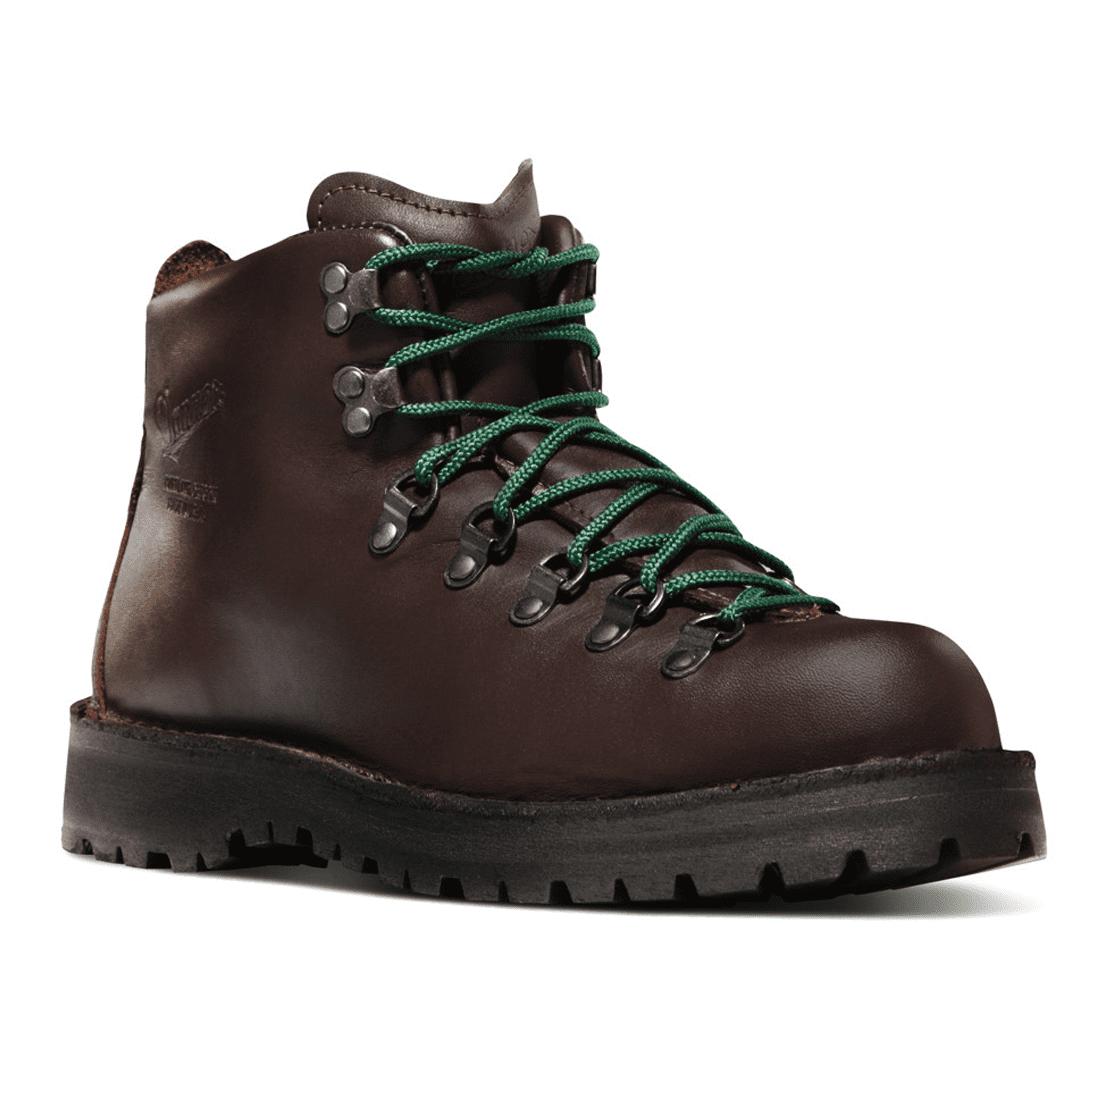 Danner 30800 Mountain Light II Mens Outdoor Hiking Boot